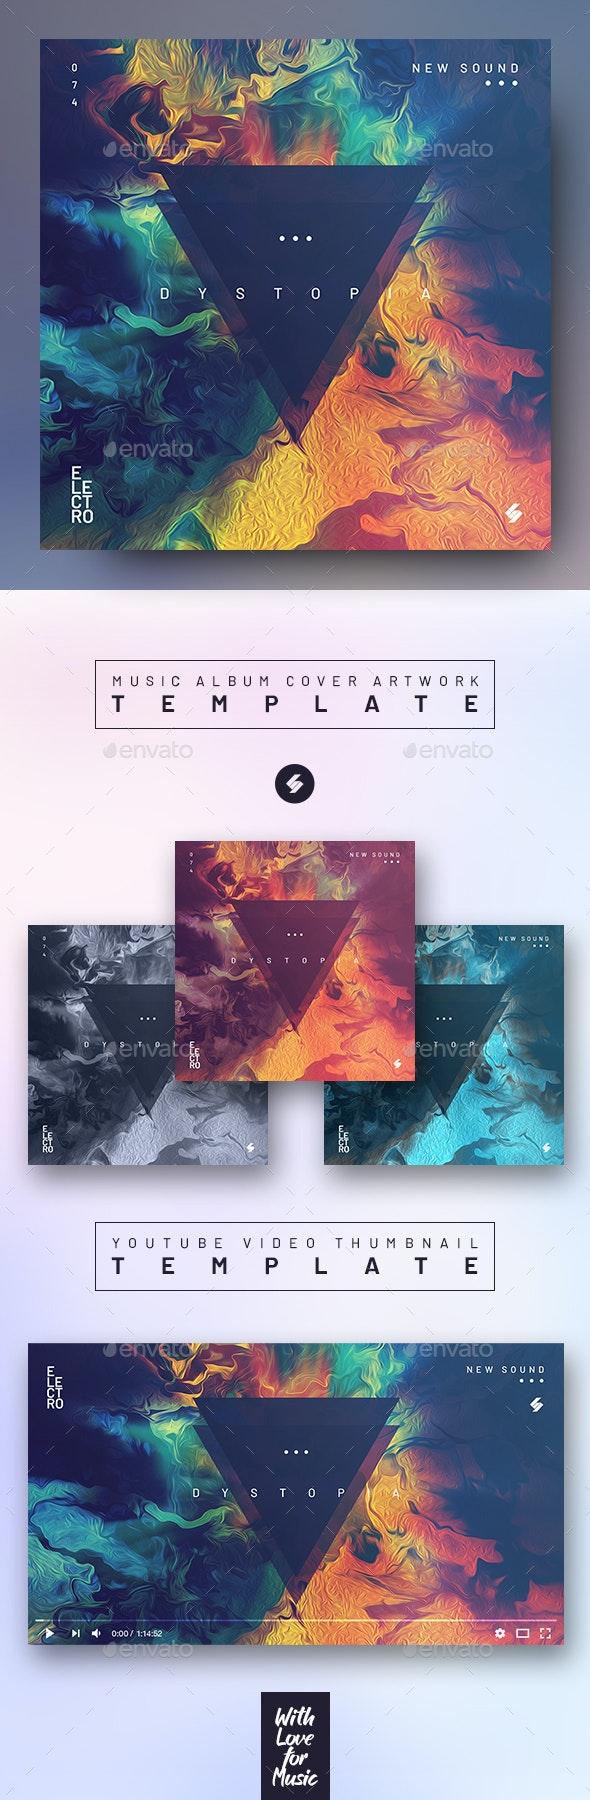 Electro Dystopia – Music Album Cover Artwork / Video Thumbnail Template - Miscellaneous Social Media